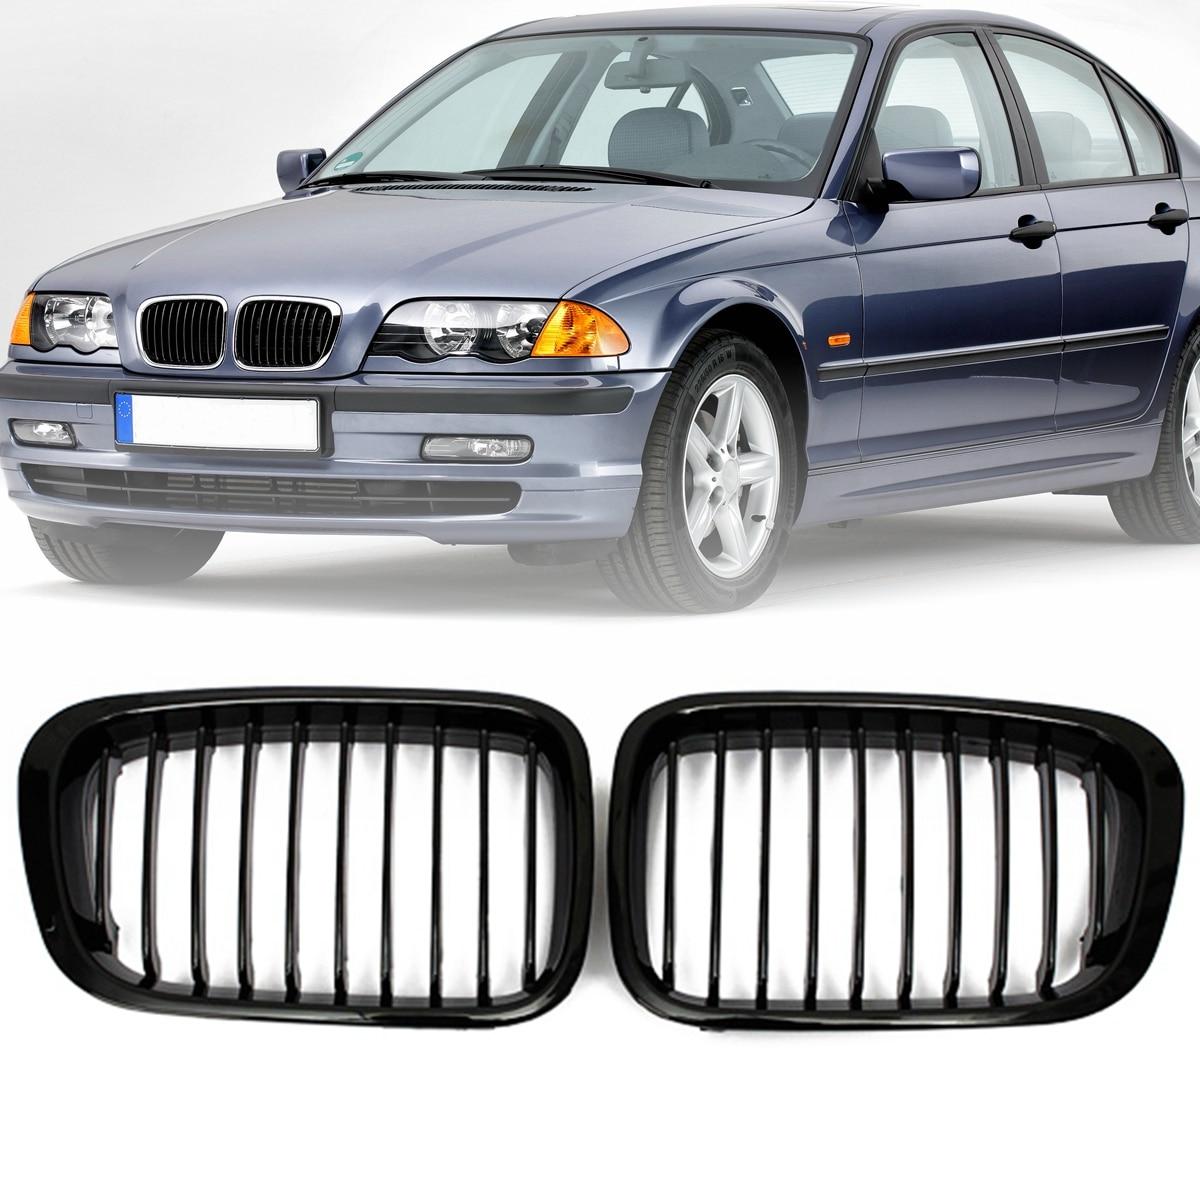 Par negro brillante/negro mate rejilla frontal para BMW 3 Series E46 1999 2000 2001 4 puertas 323 325